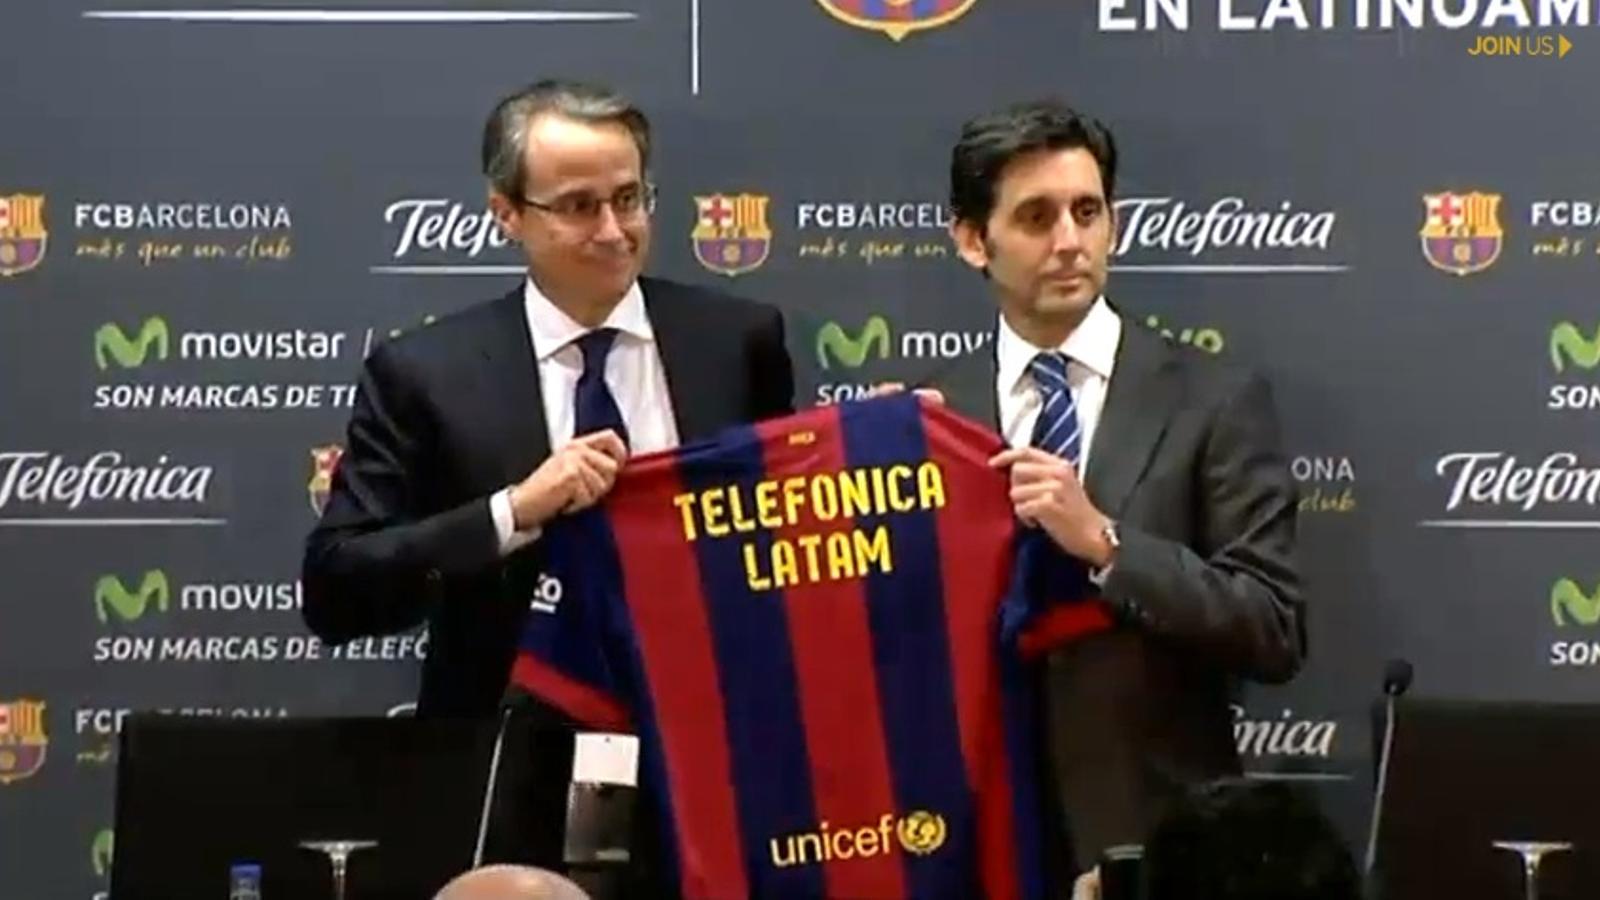 Javier Faus, vicepresident del Barça, i José María Álvarez Pallete, conseller delegat de Telefónica / BARÇA TV